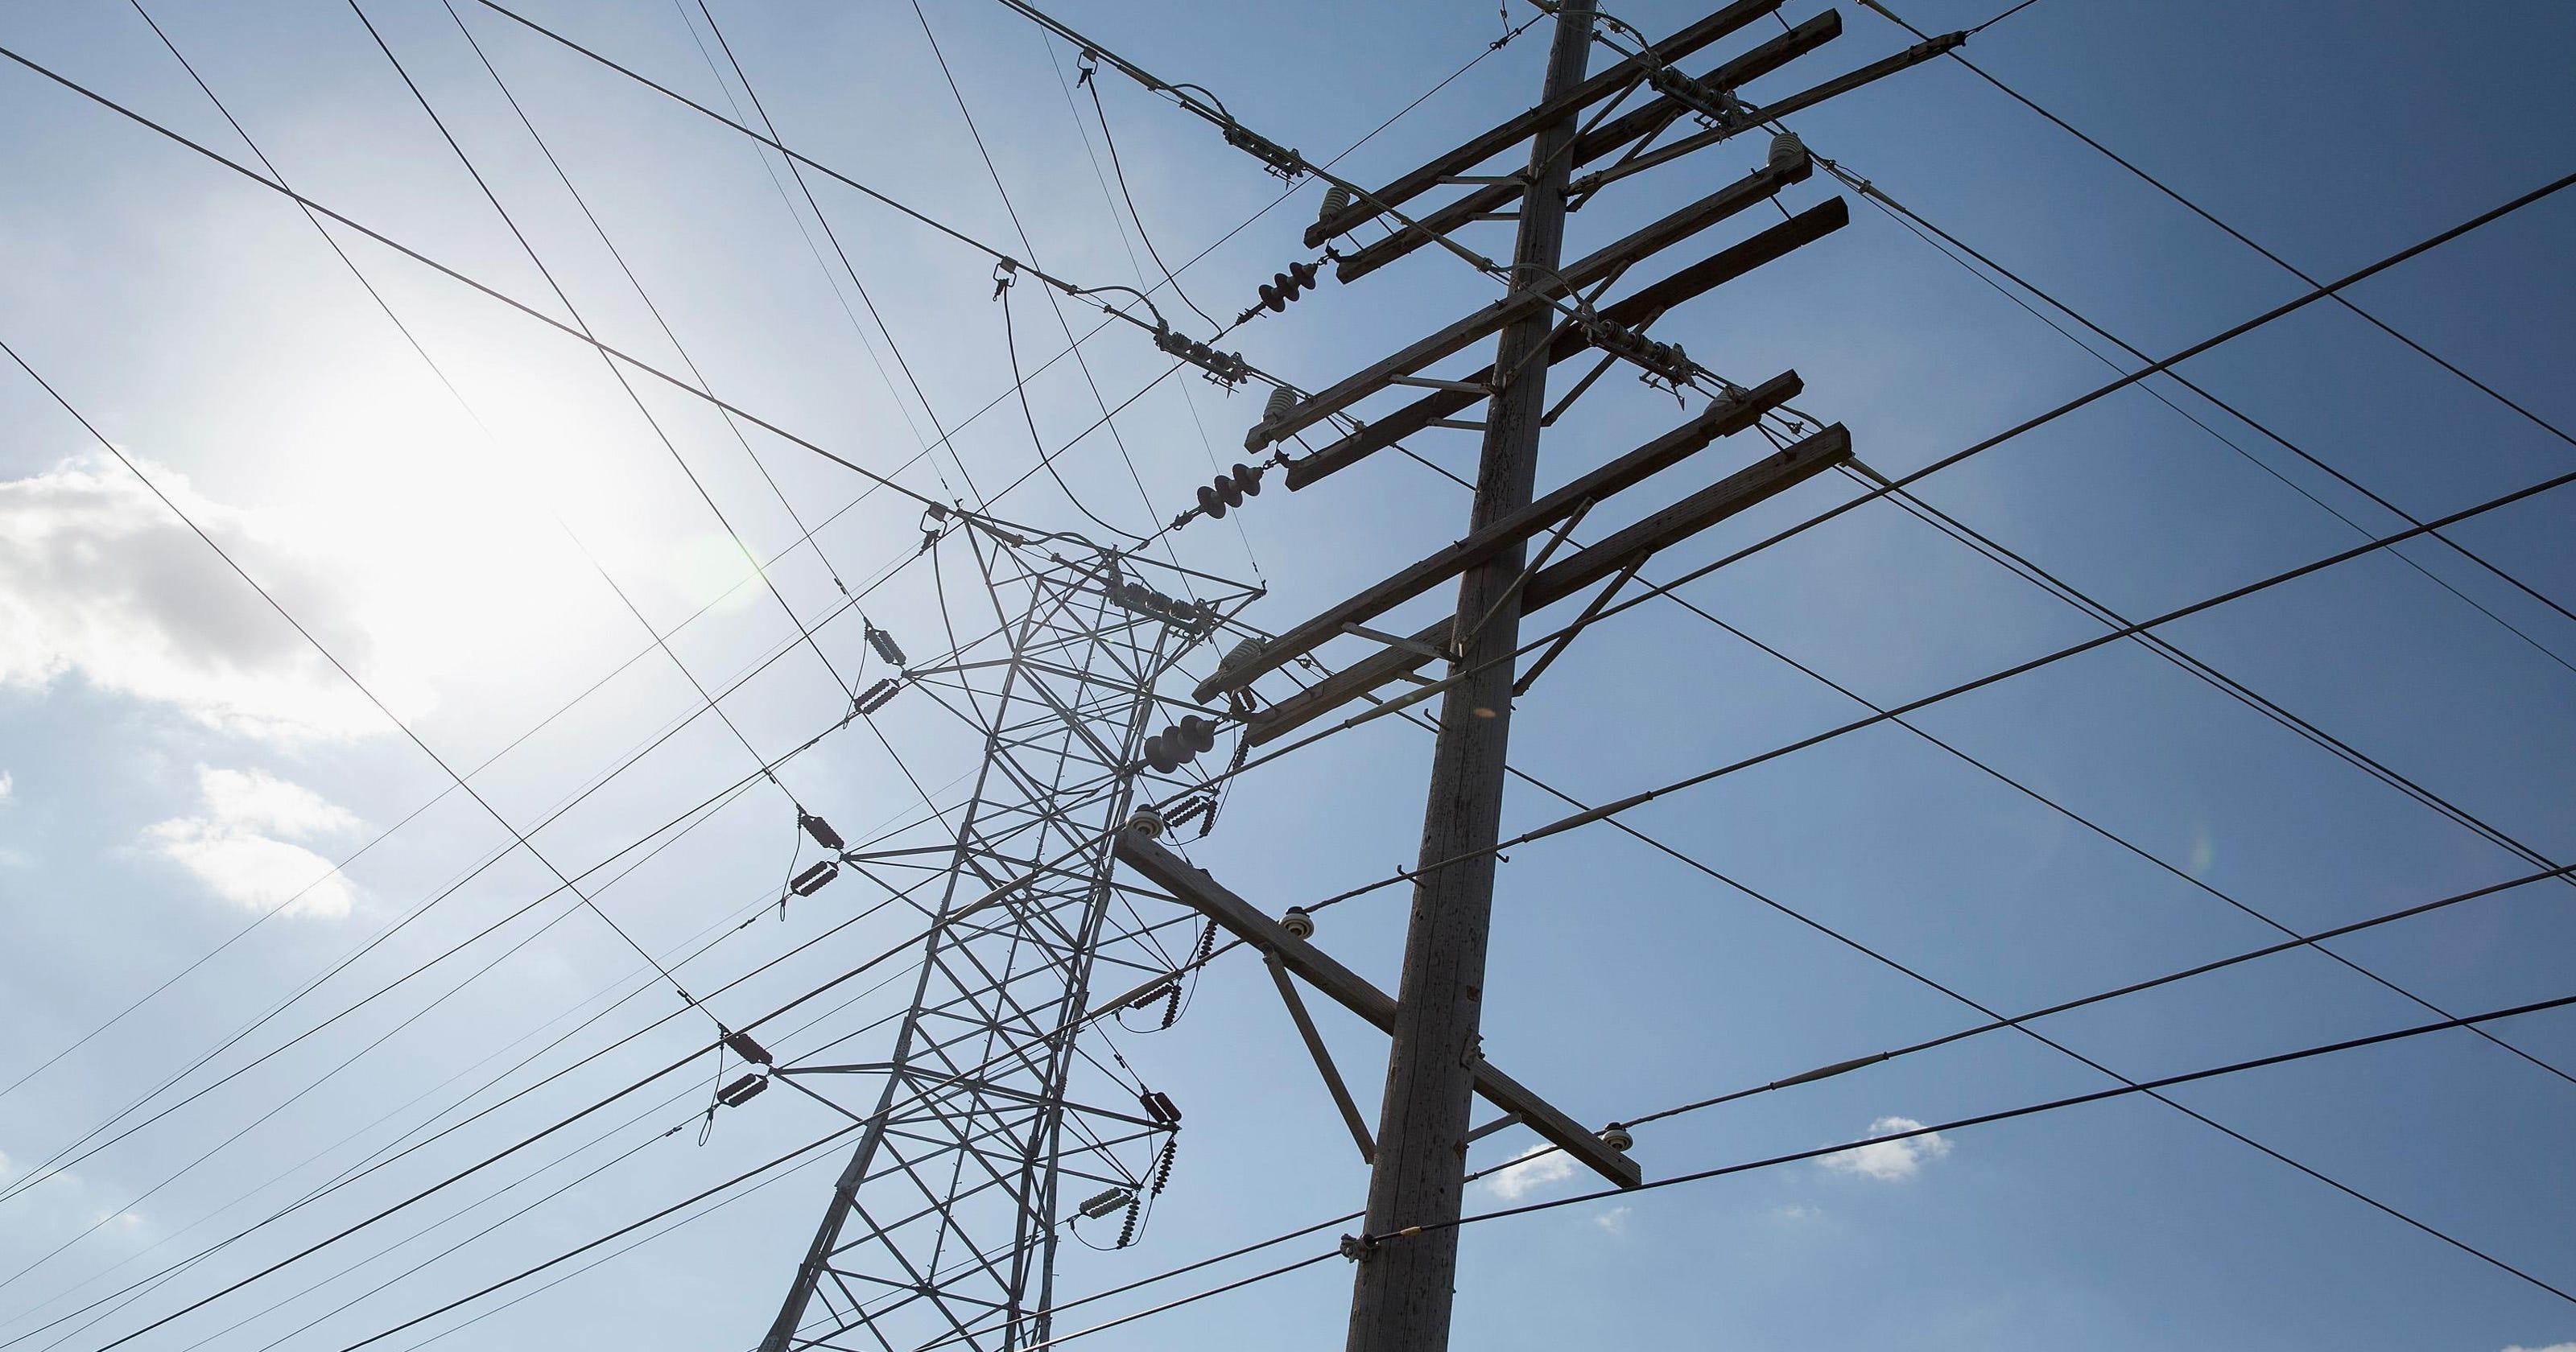 Nj Electric Rates Jcp L Goes Down Atlantic City Pse G Go Up